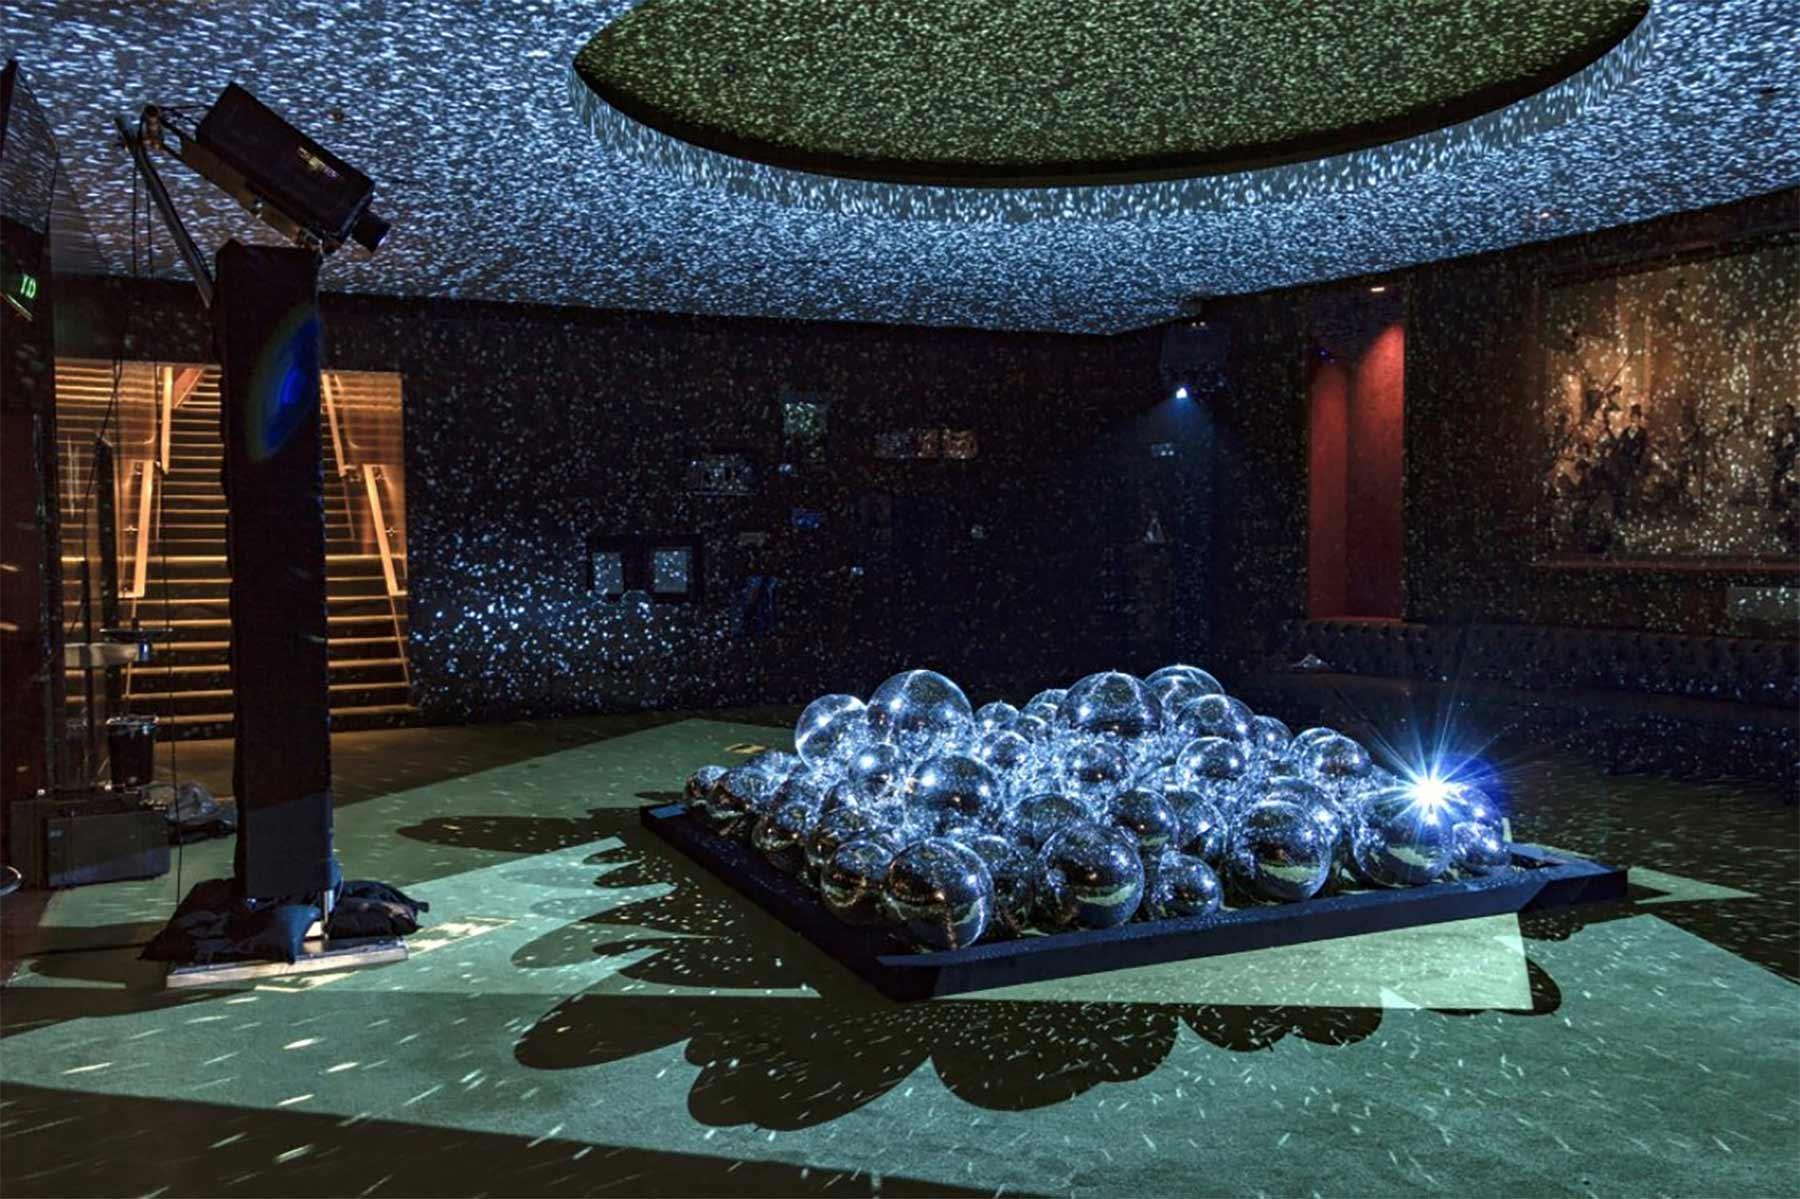 50 Discokugeln in einem Raum light-leaks-discokugeln_05